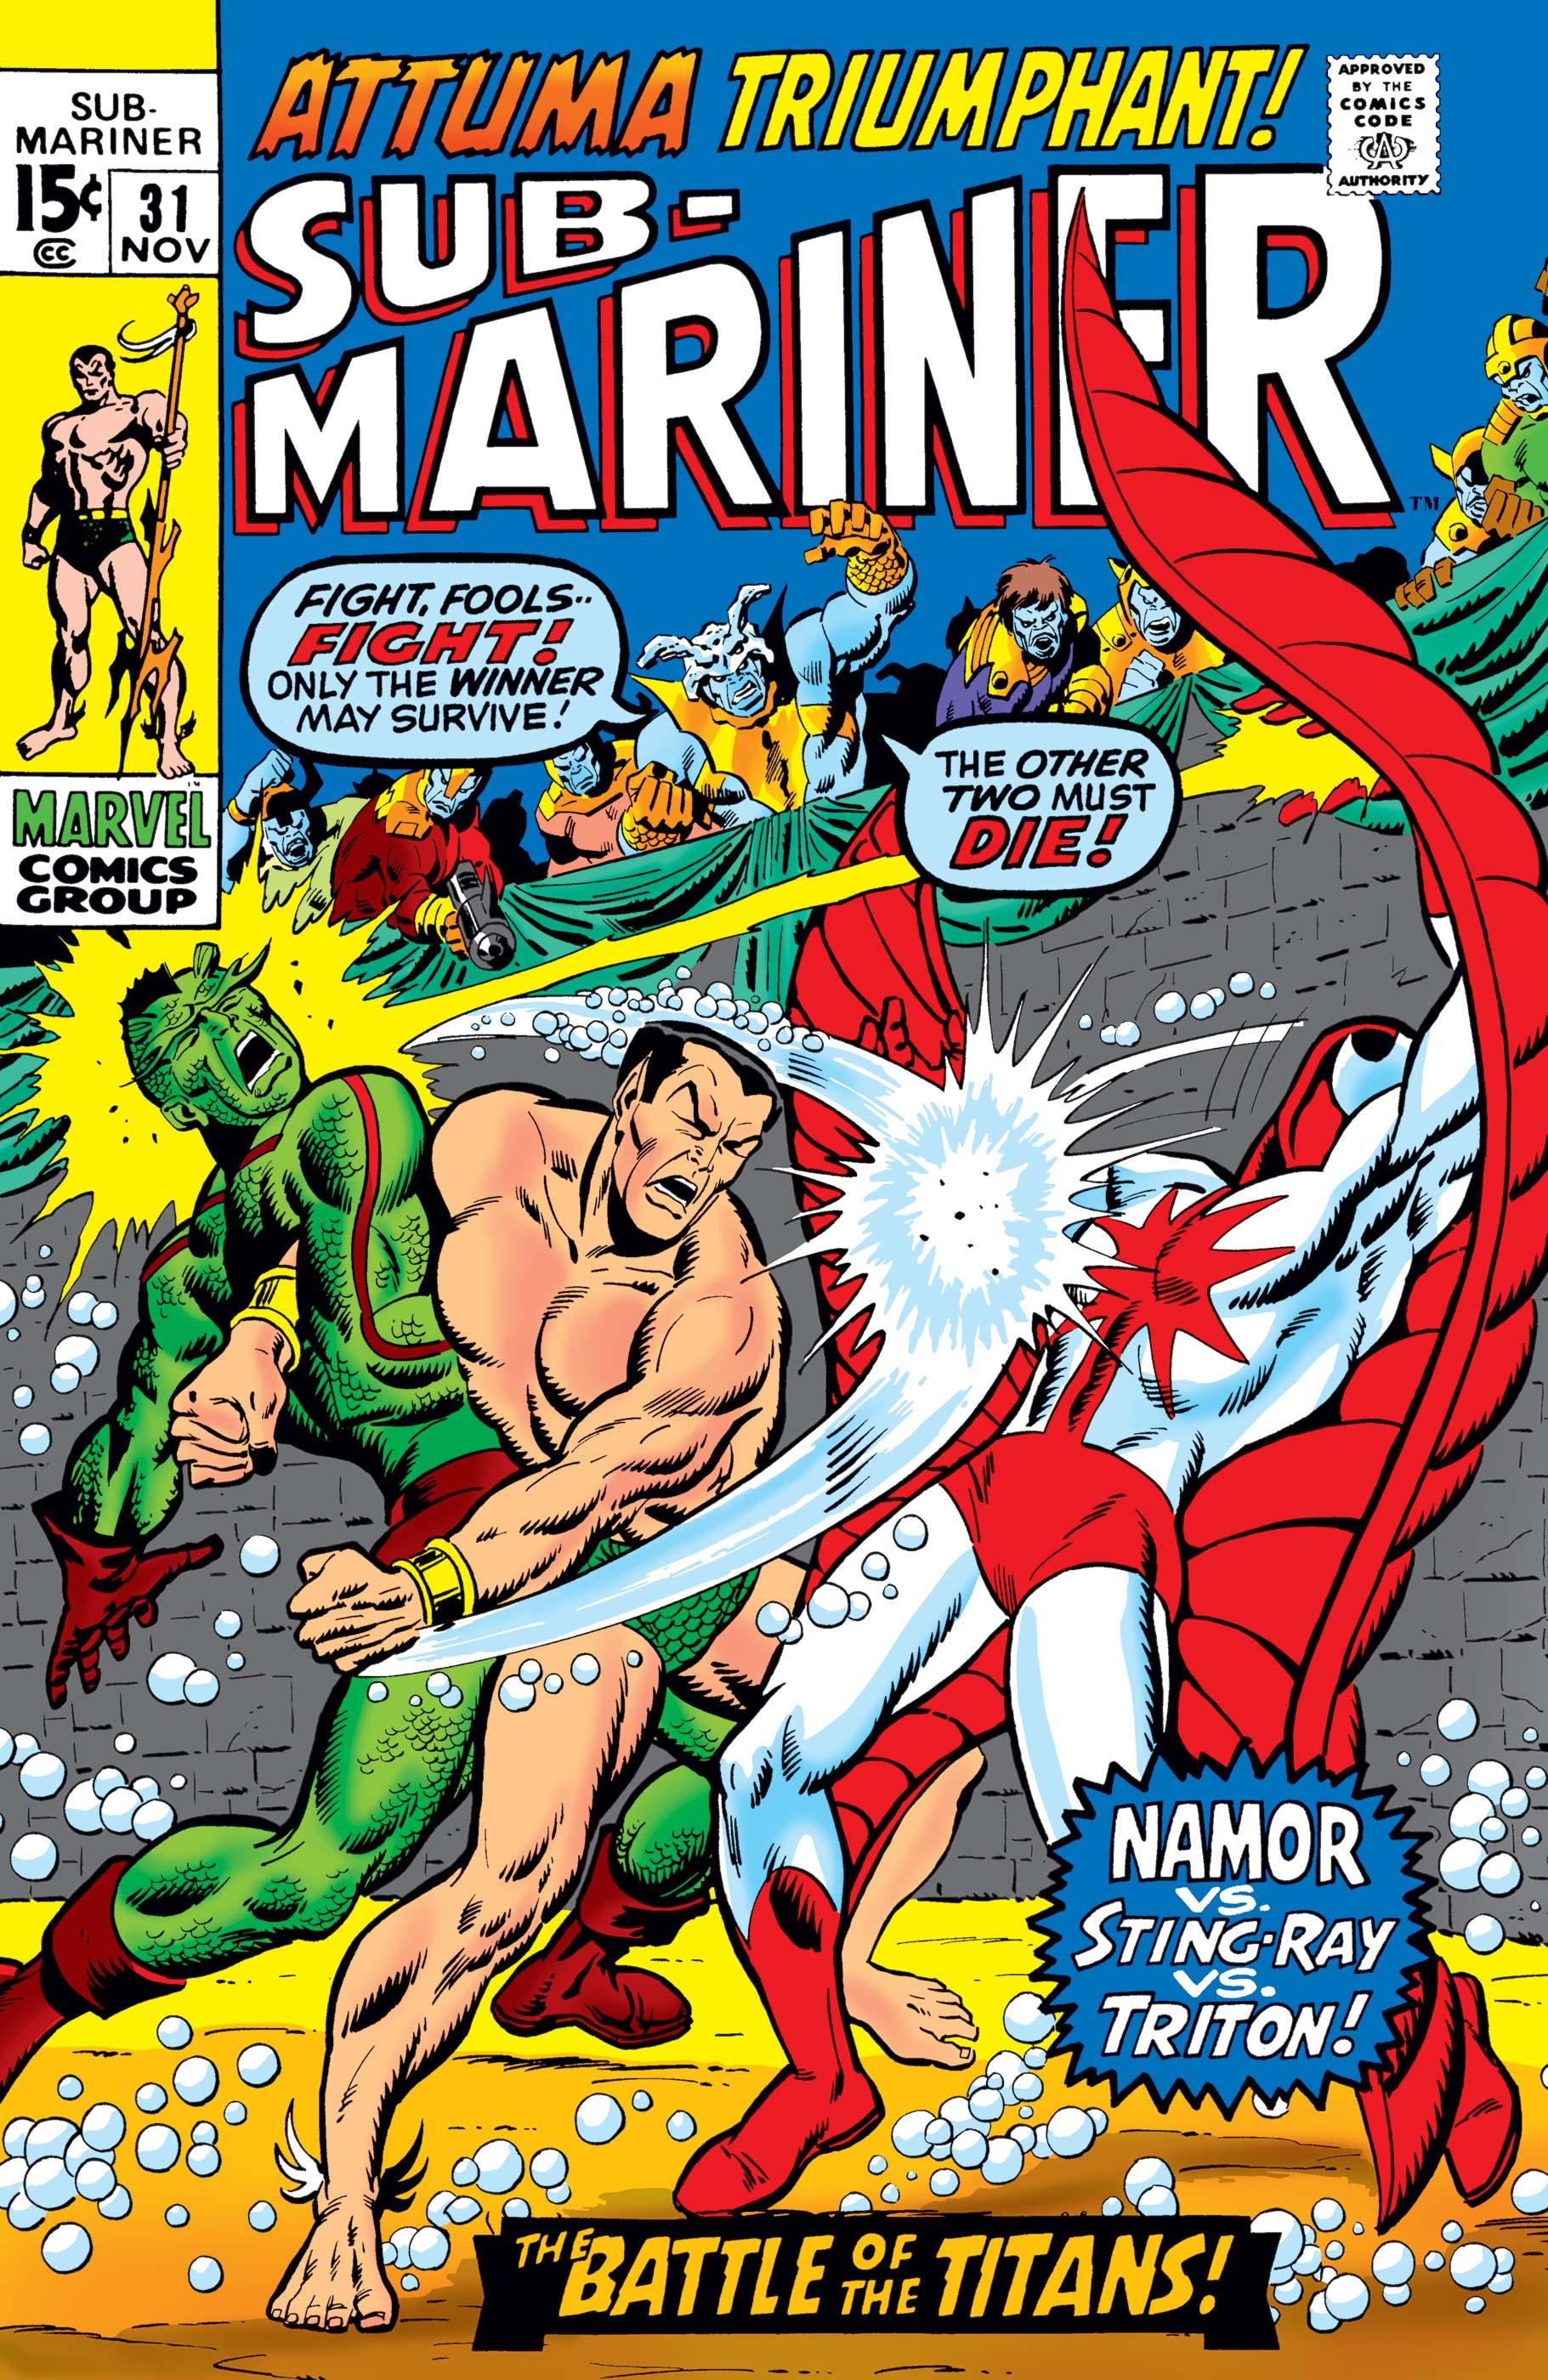 Sub-Mariner (1968) #31